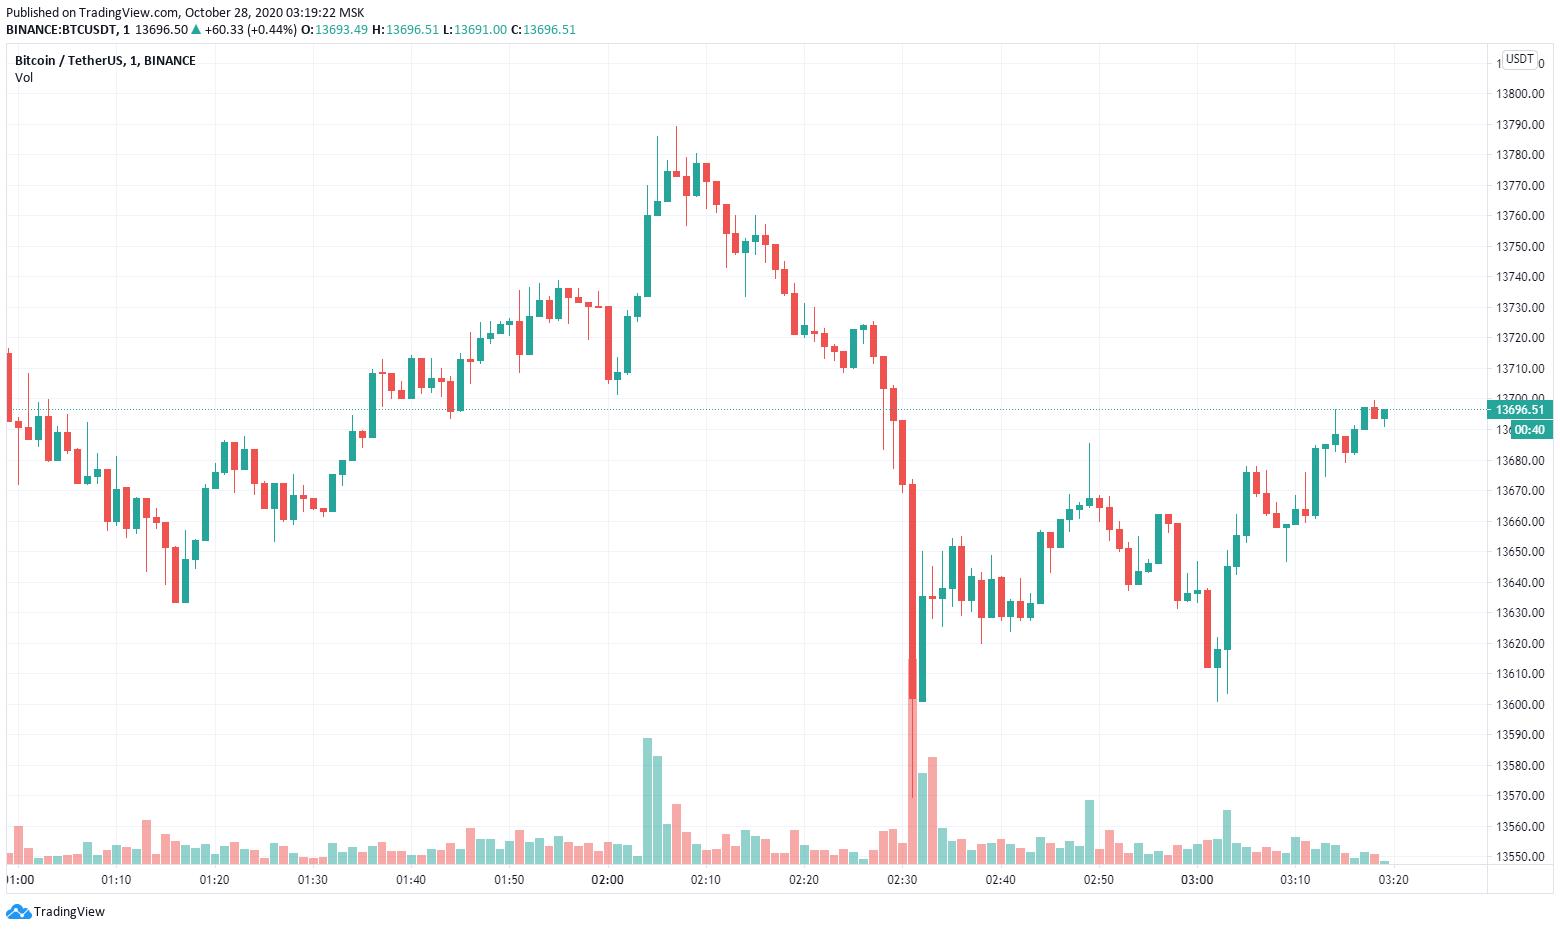 Пока биткоин обновлял ценовой максимум Coinbase остановила торги